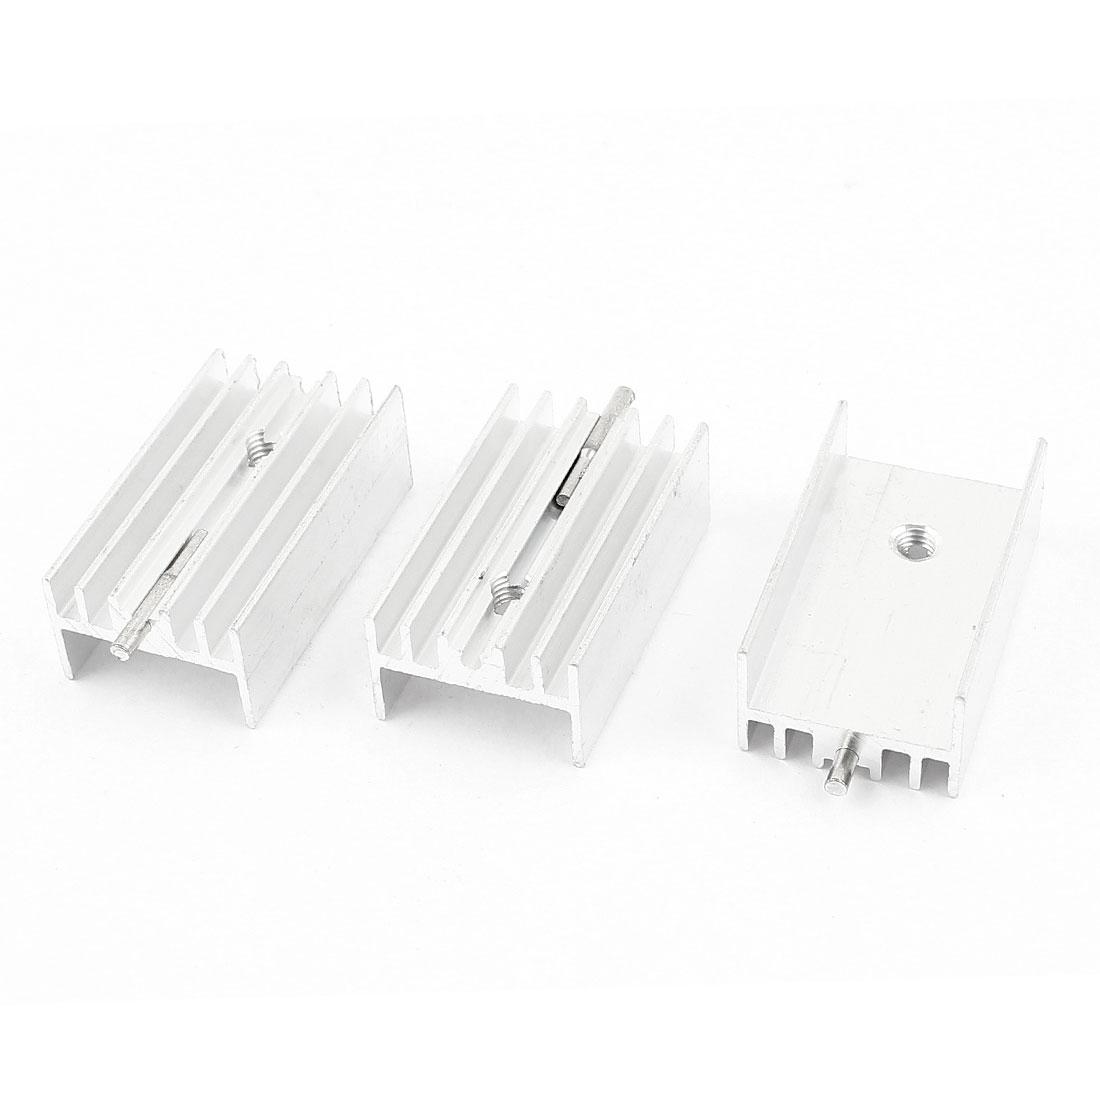 3 Pcs Silver Tone Aluminum Heat Sink 25x15x10mm for TO-220 Transistors